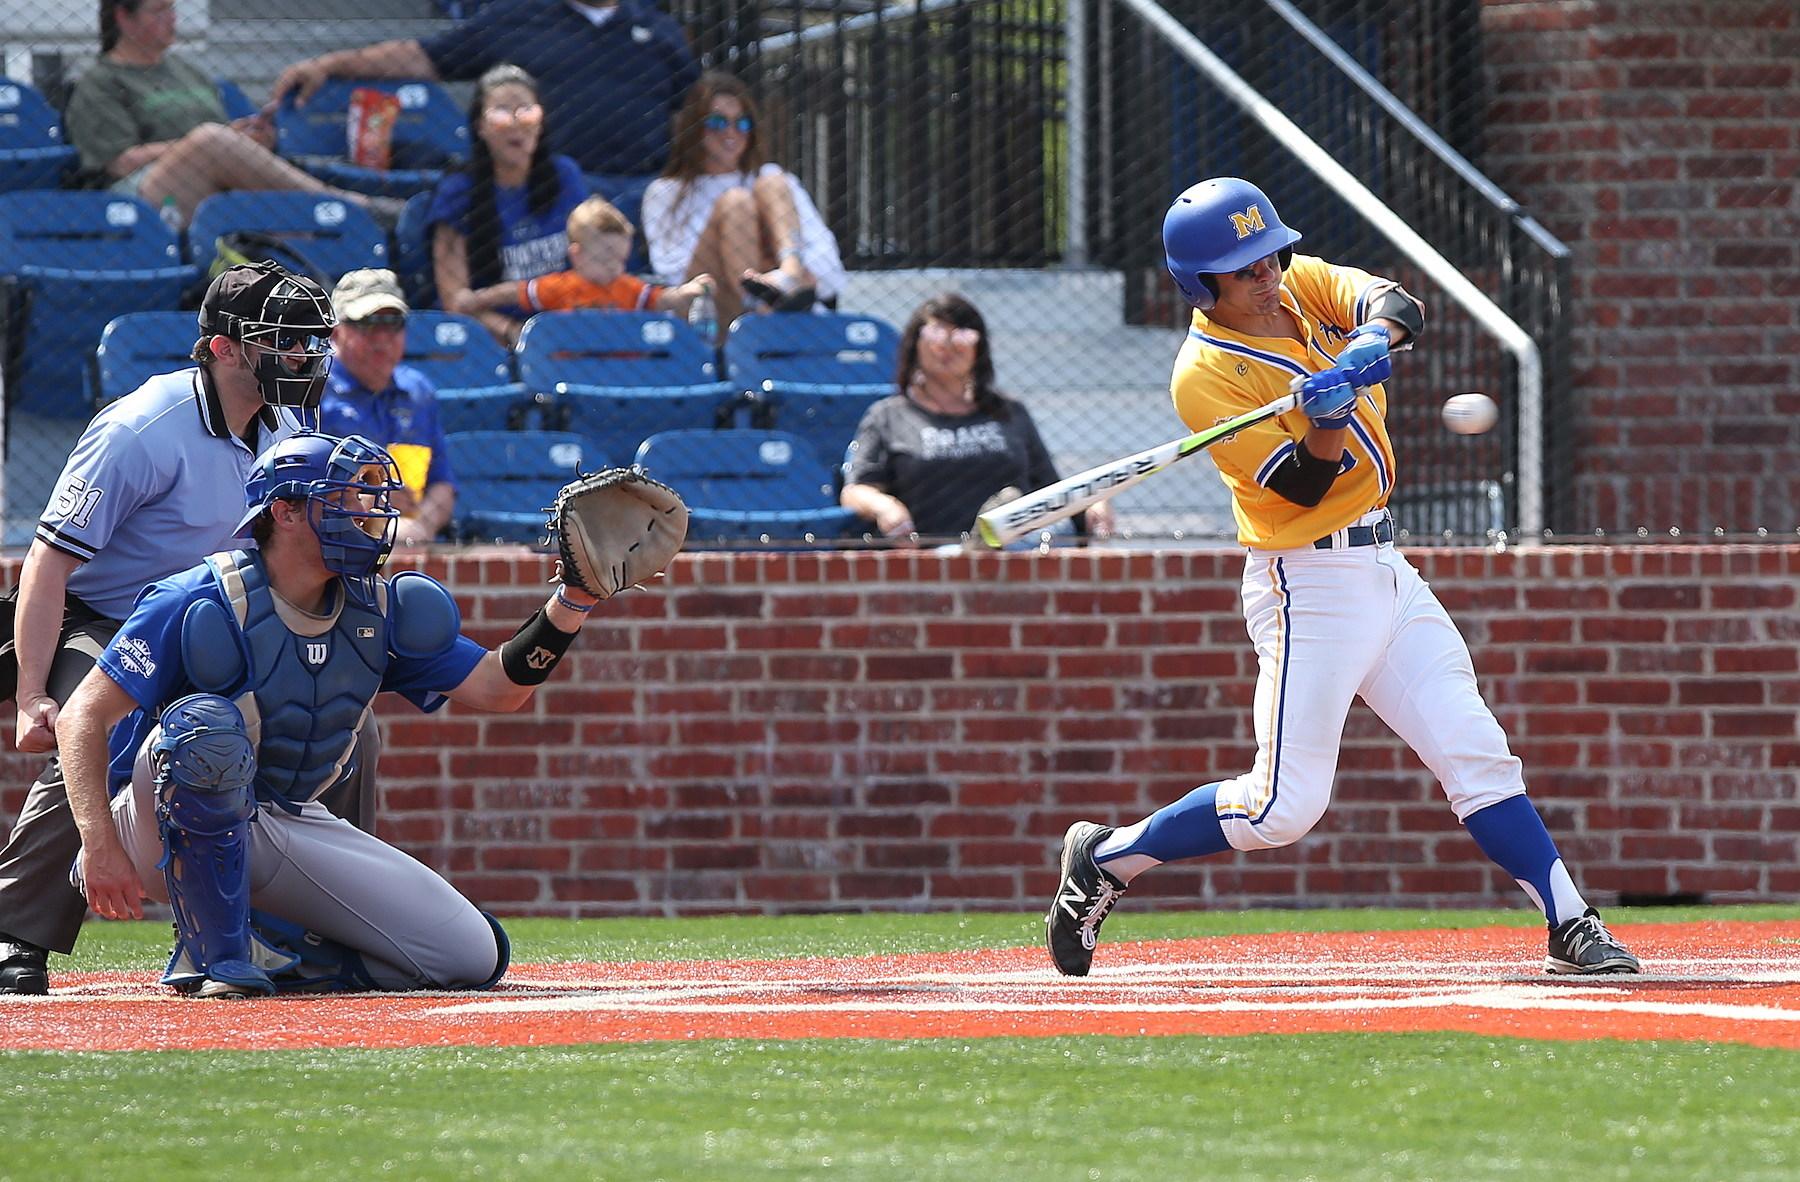 McNeese Baseball (Photo provided Matt Bonnette MSU)